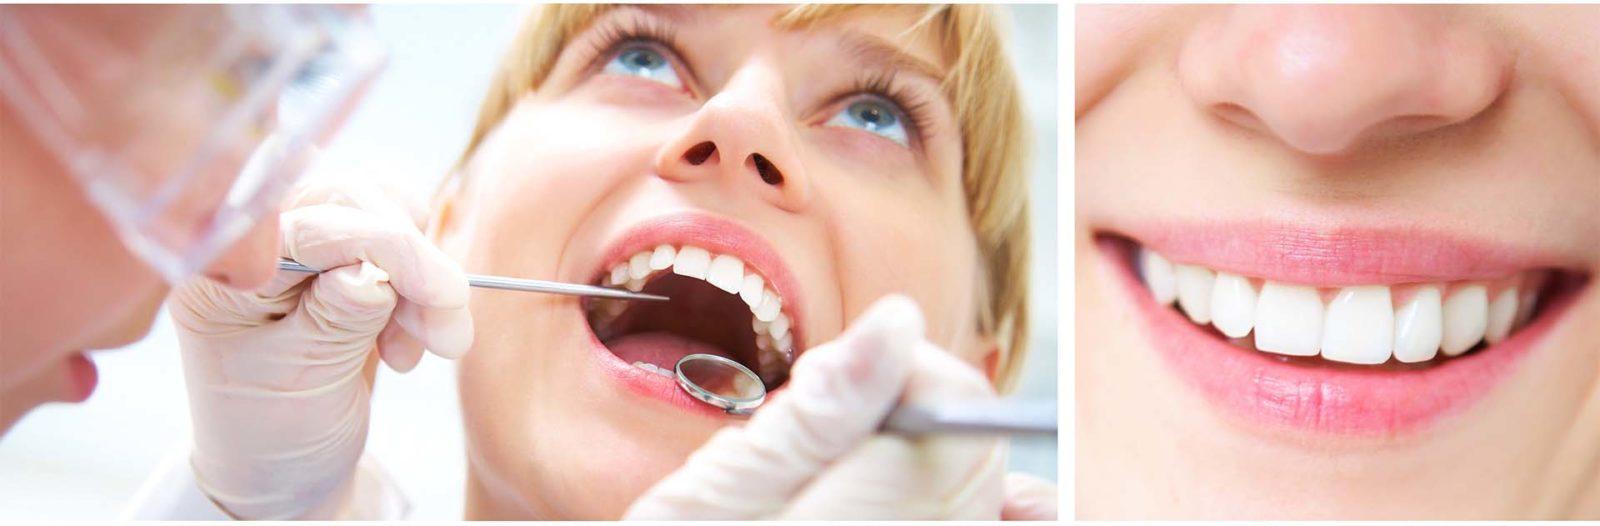 проверка зубов